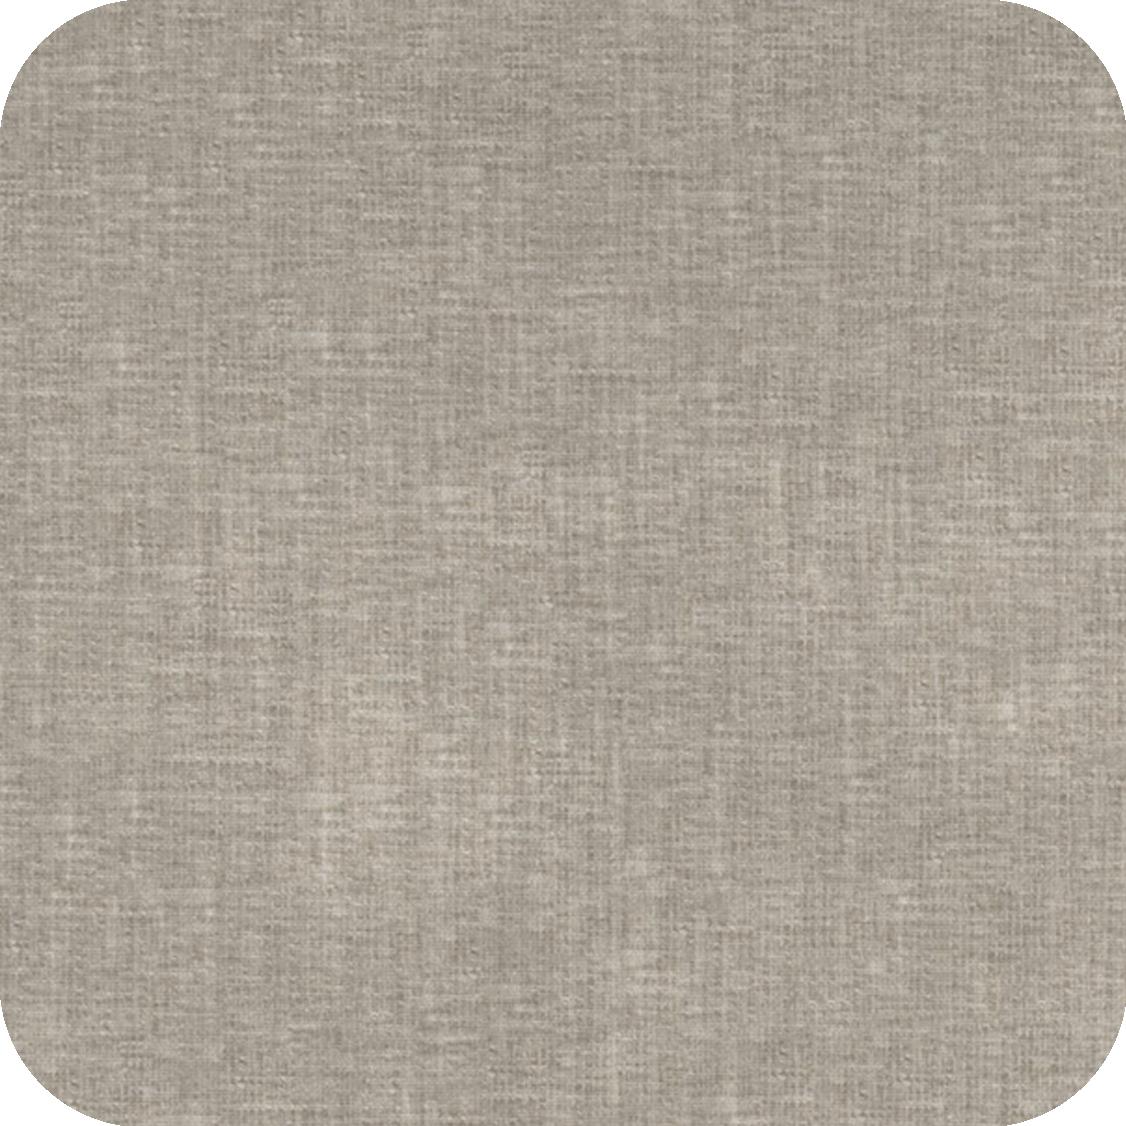 tela para cortina tradicional_tela para retapizado